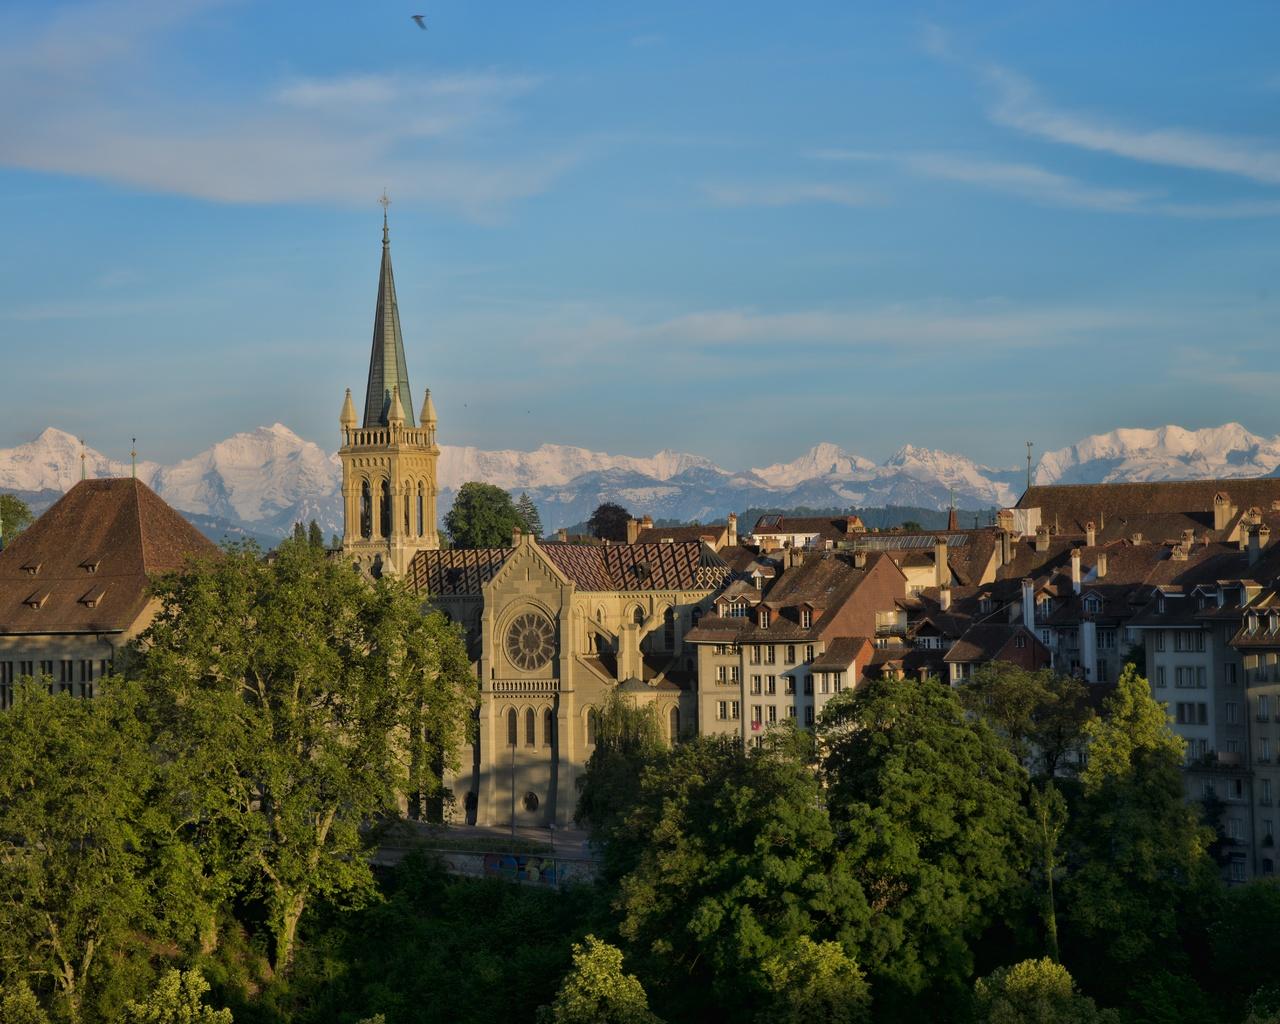 берн, швейцария, дома, башня, город